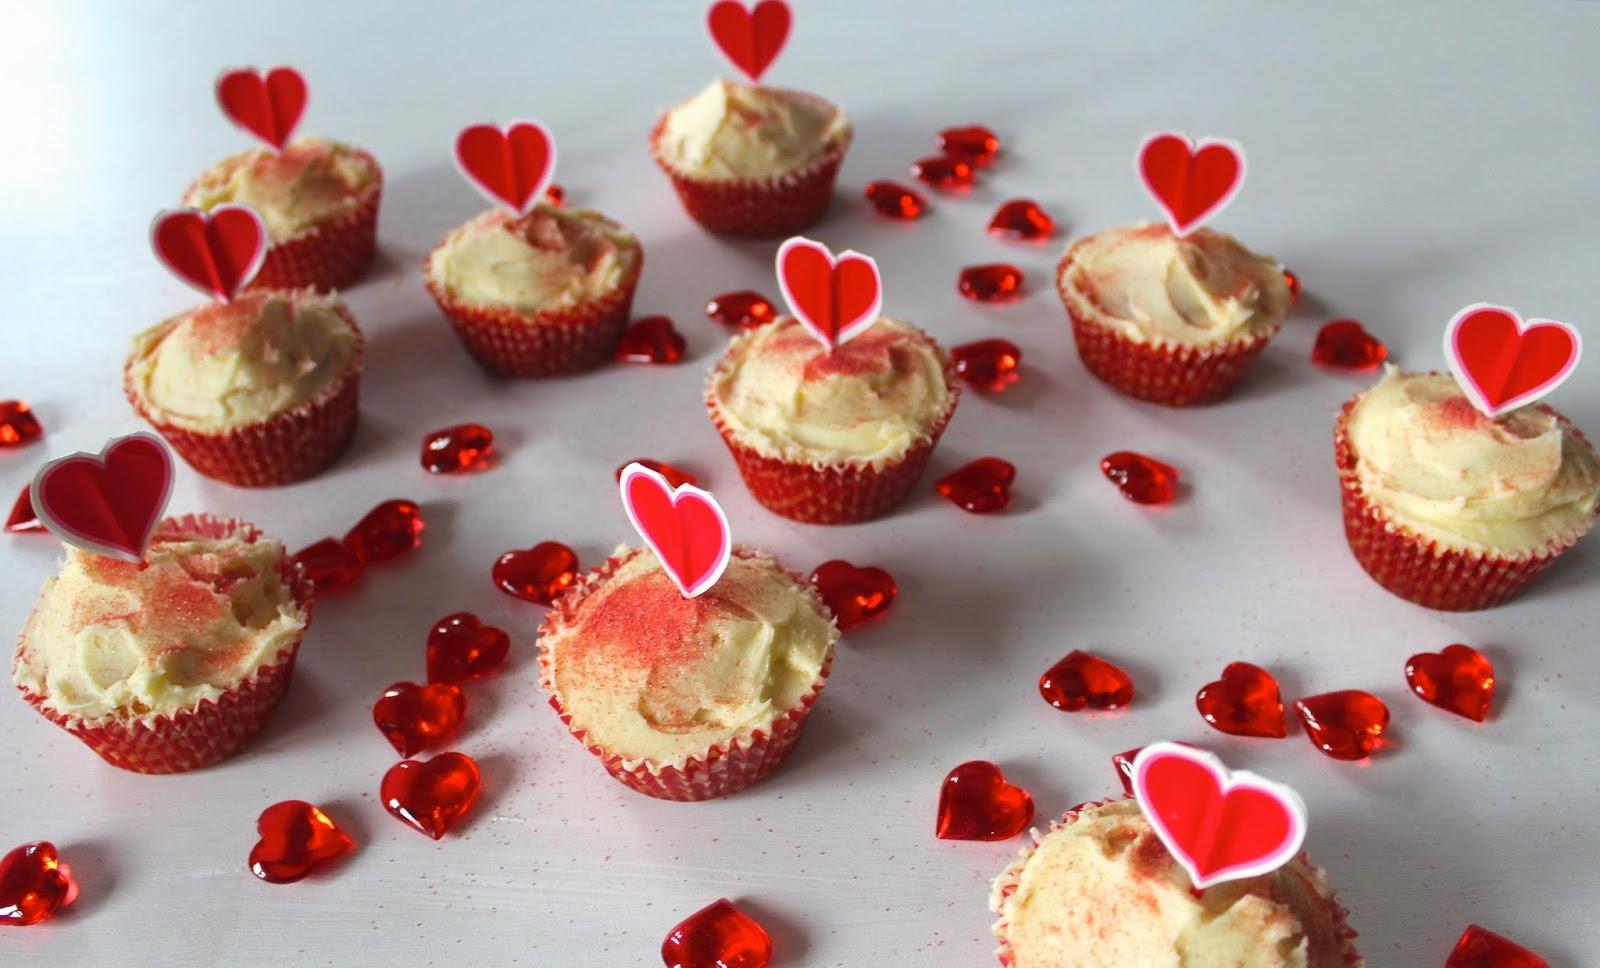 amazon, baking, bakingrecipe, bbcfoodrecipe, cupcakerecipe, cupcakes, halcyonvelvet, hearts, lbloggers, poundland, valentinesday, valentinesdaycupcakes, vanillacupcakes,